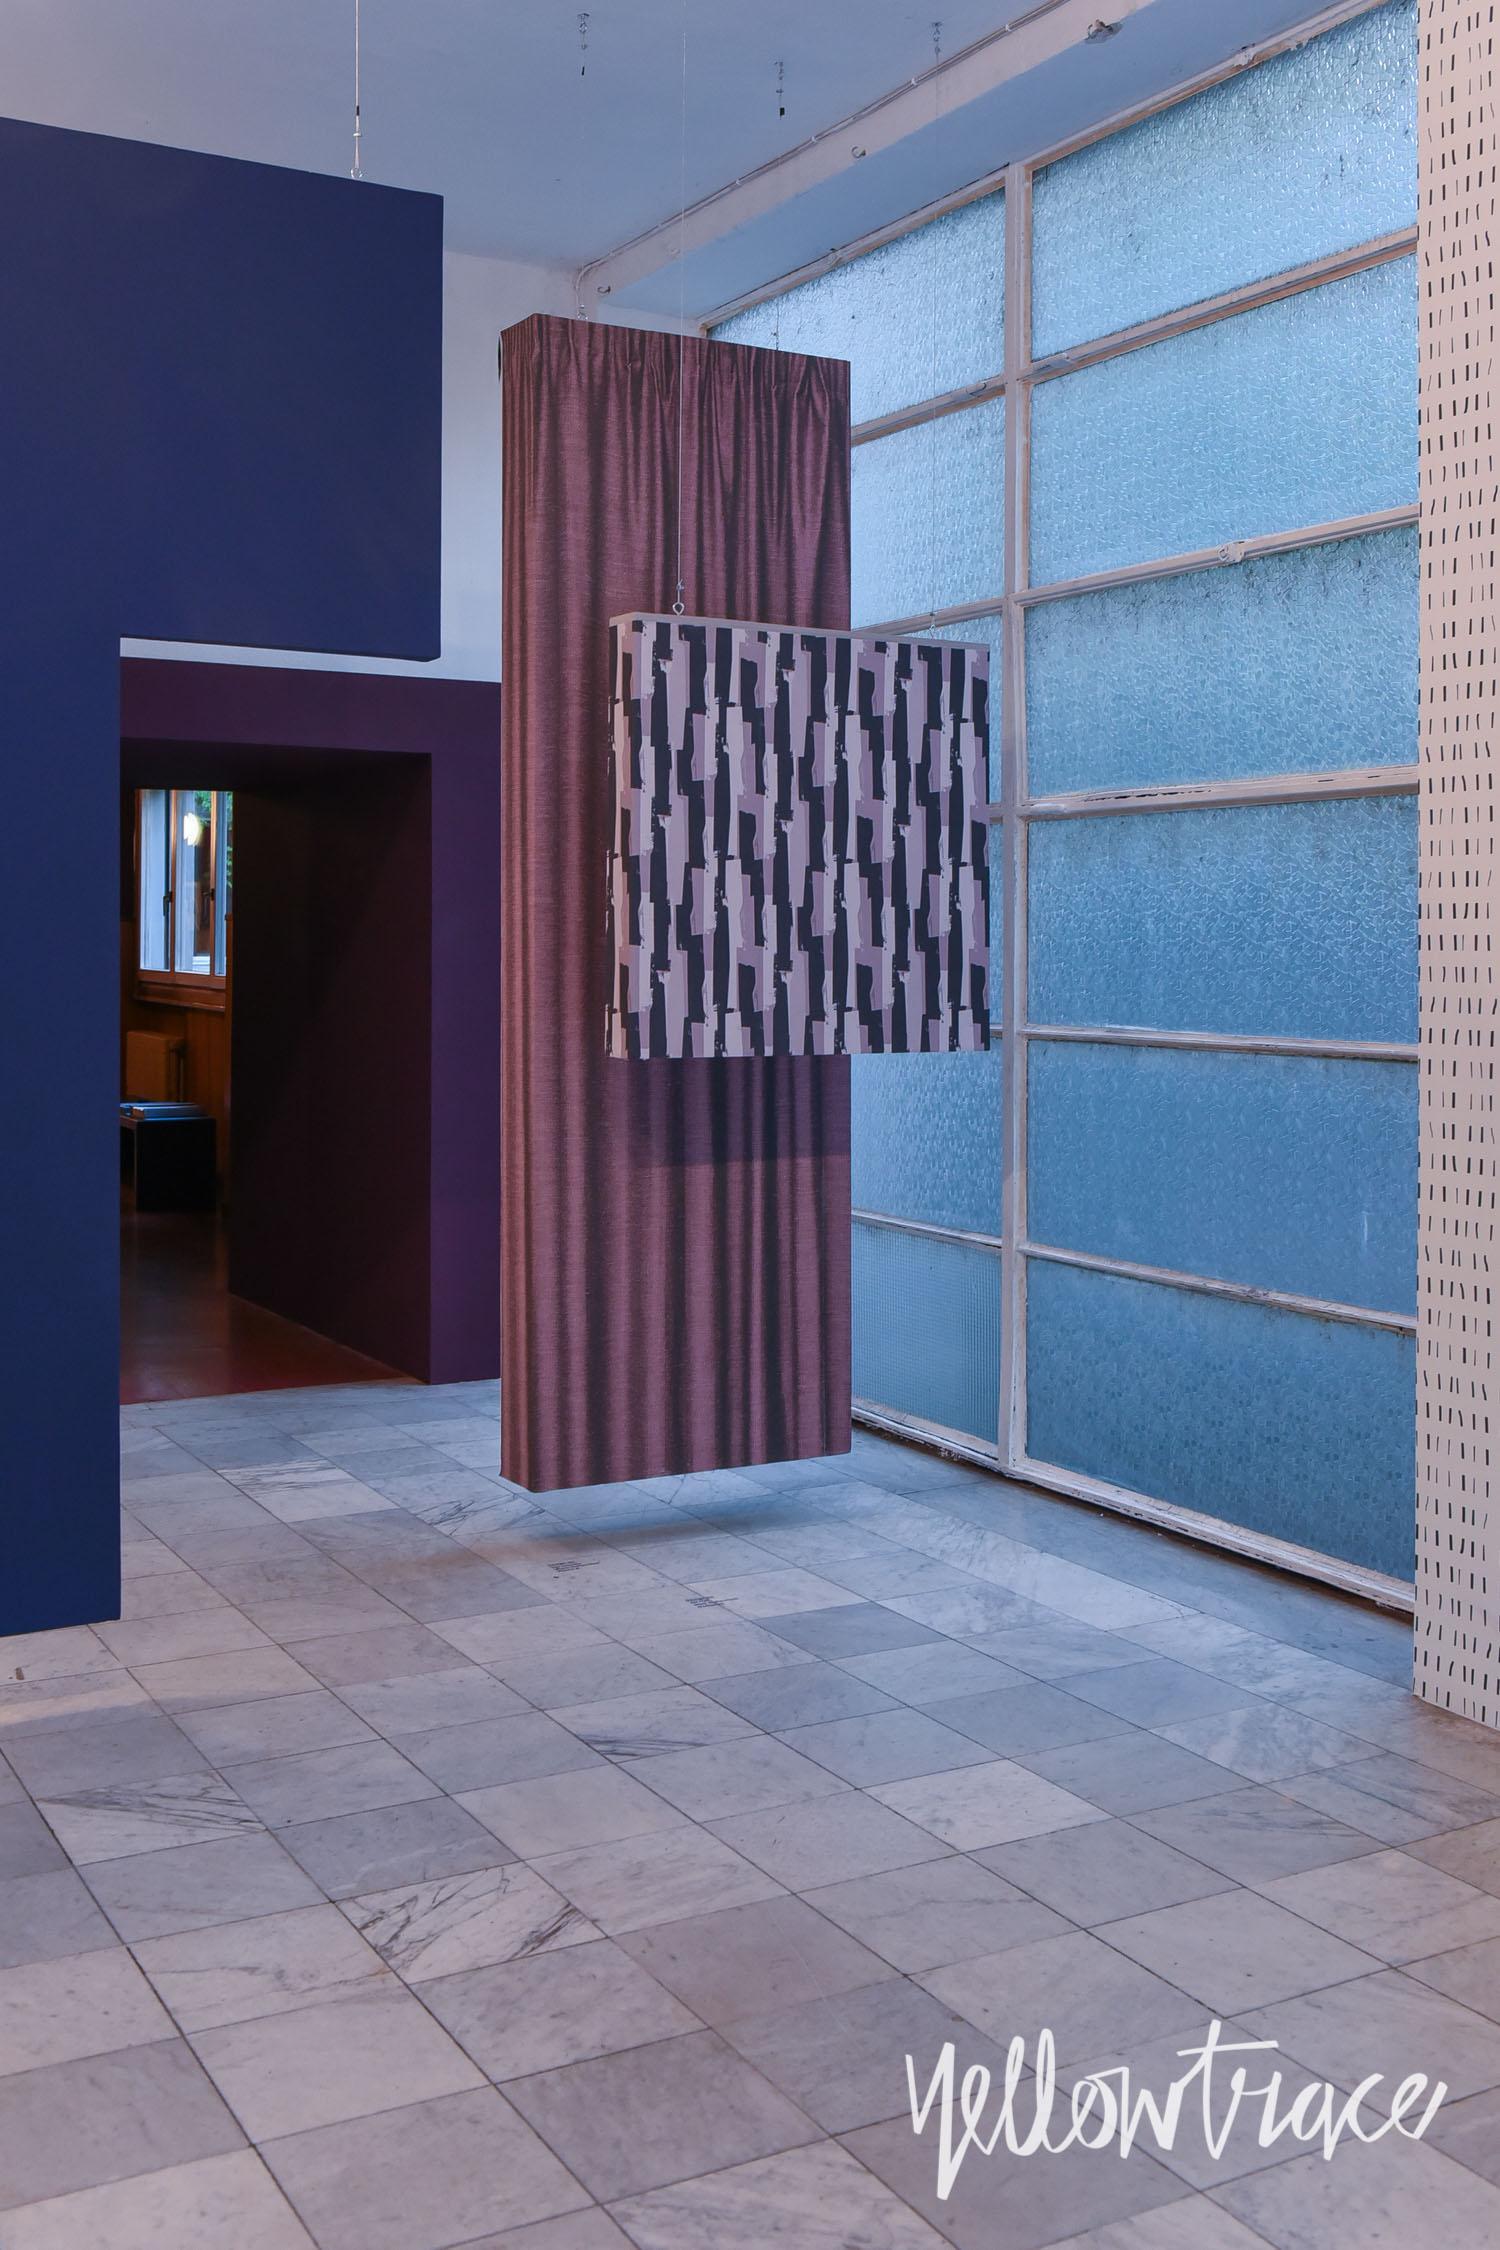 Milan Design Week 2017 Highlights, KARPETA Rugs + Texturae Wallpapers Installation , Photo © Nick Hughes | #Milantrace2017